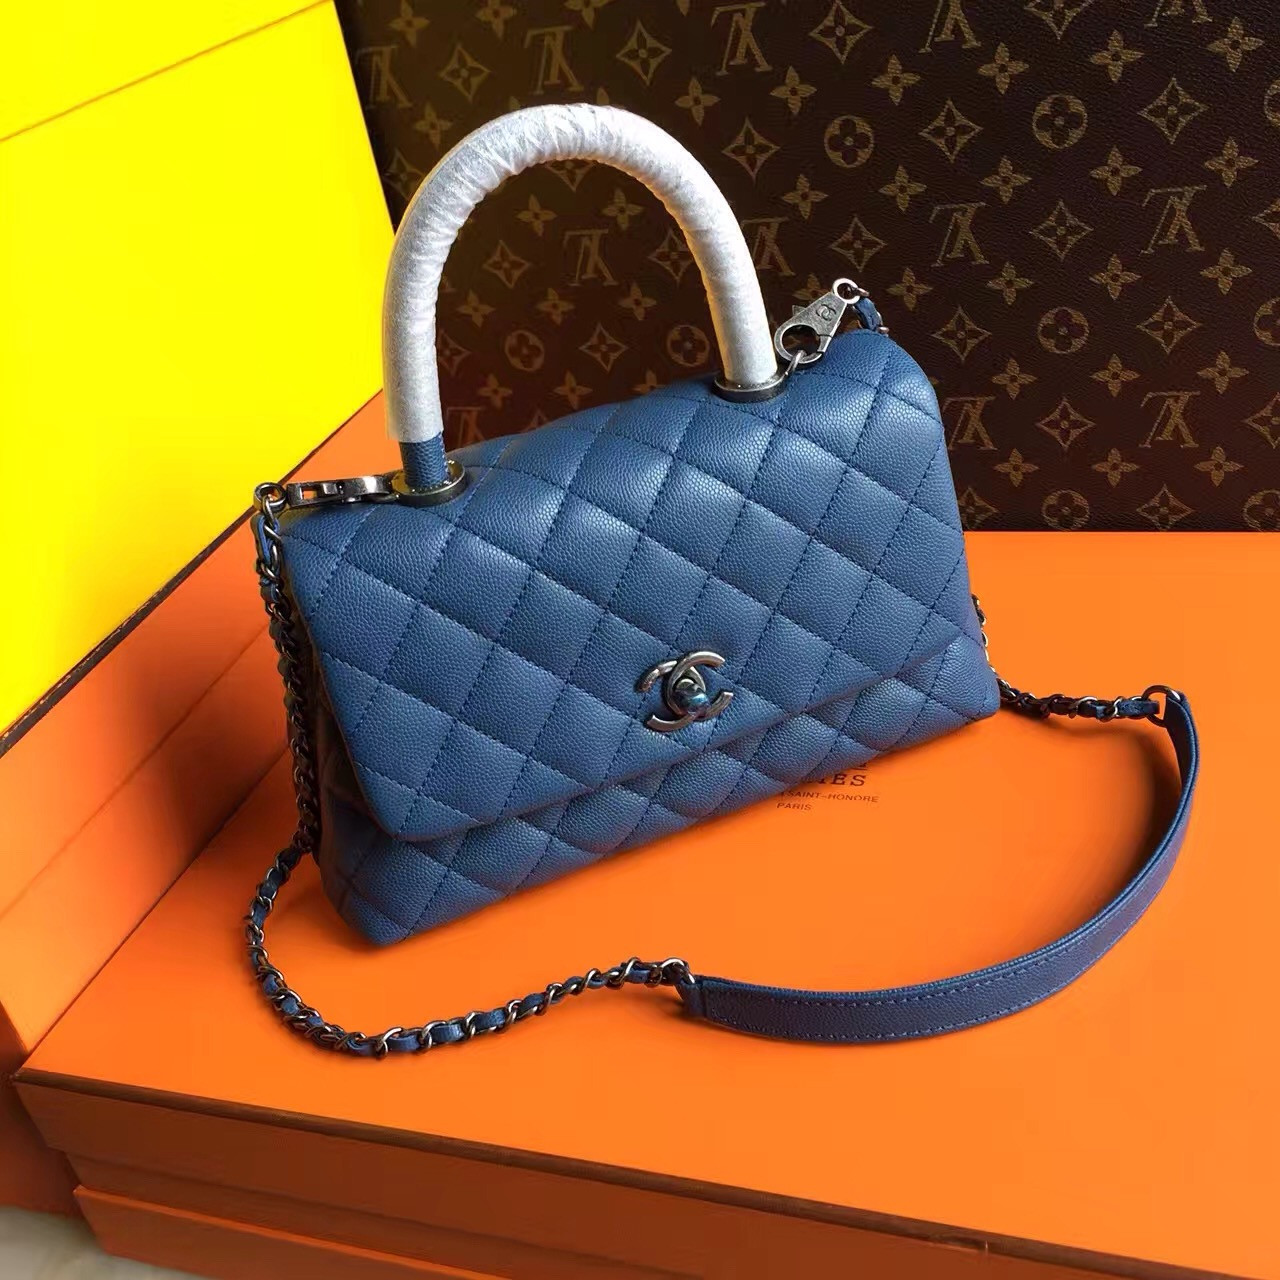 fc9b678d047a90 Chanel Battleship Blue Calfskin/Lizard Coco Handle Small Bag - Bella ...